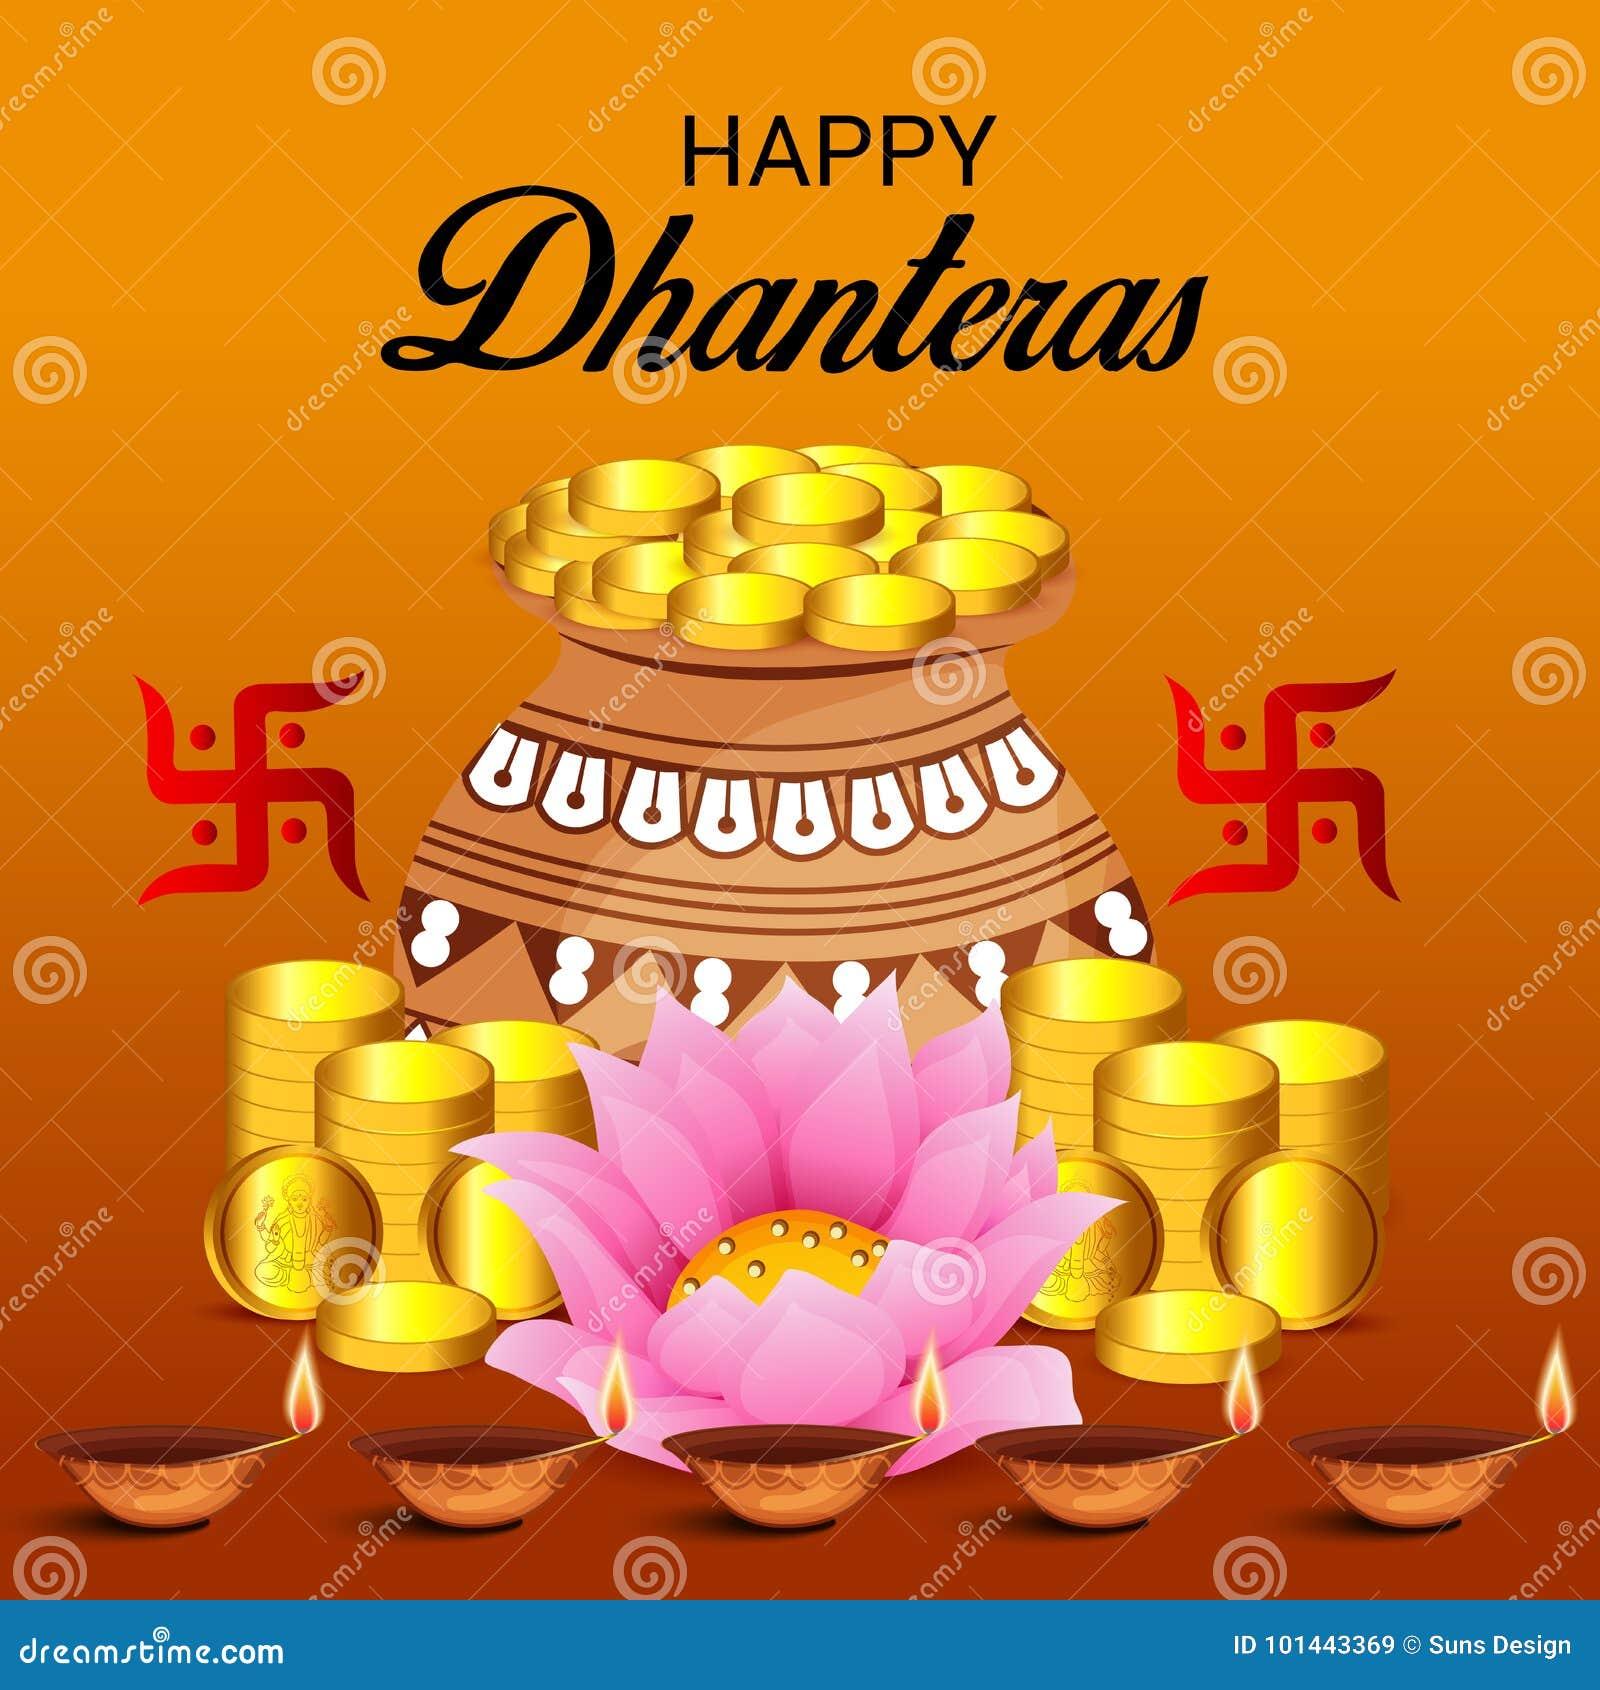 Dhanteras stock illustration illustration of card gold 101443369 download dhanteras stock illustration illustration of card gold 101443369 m4hsunfo